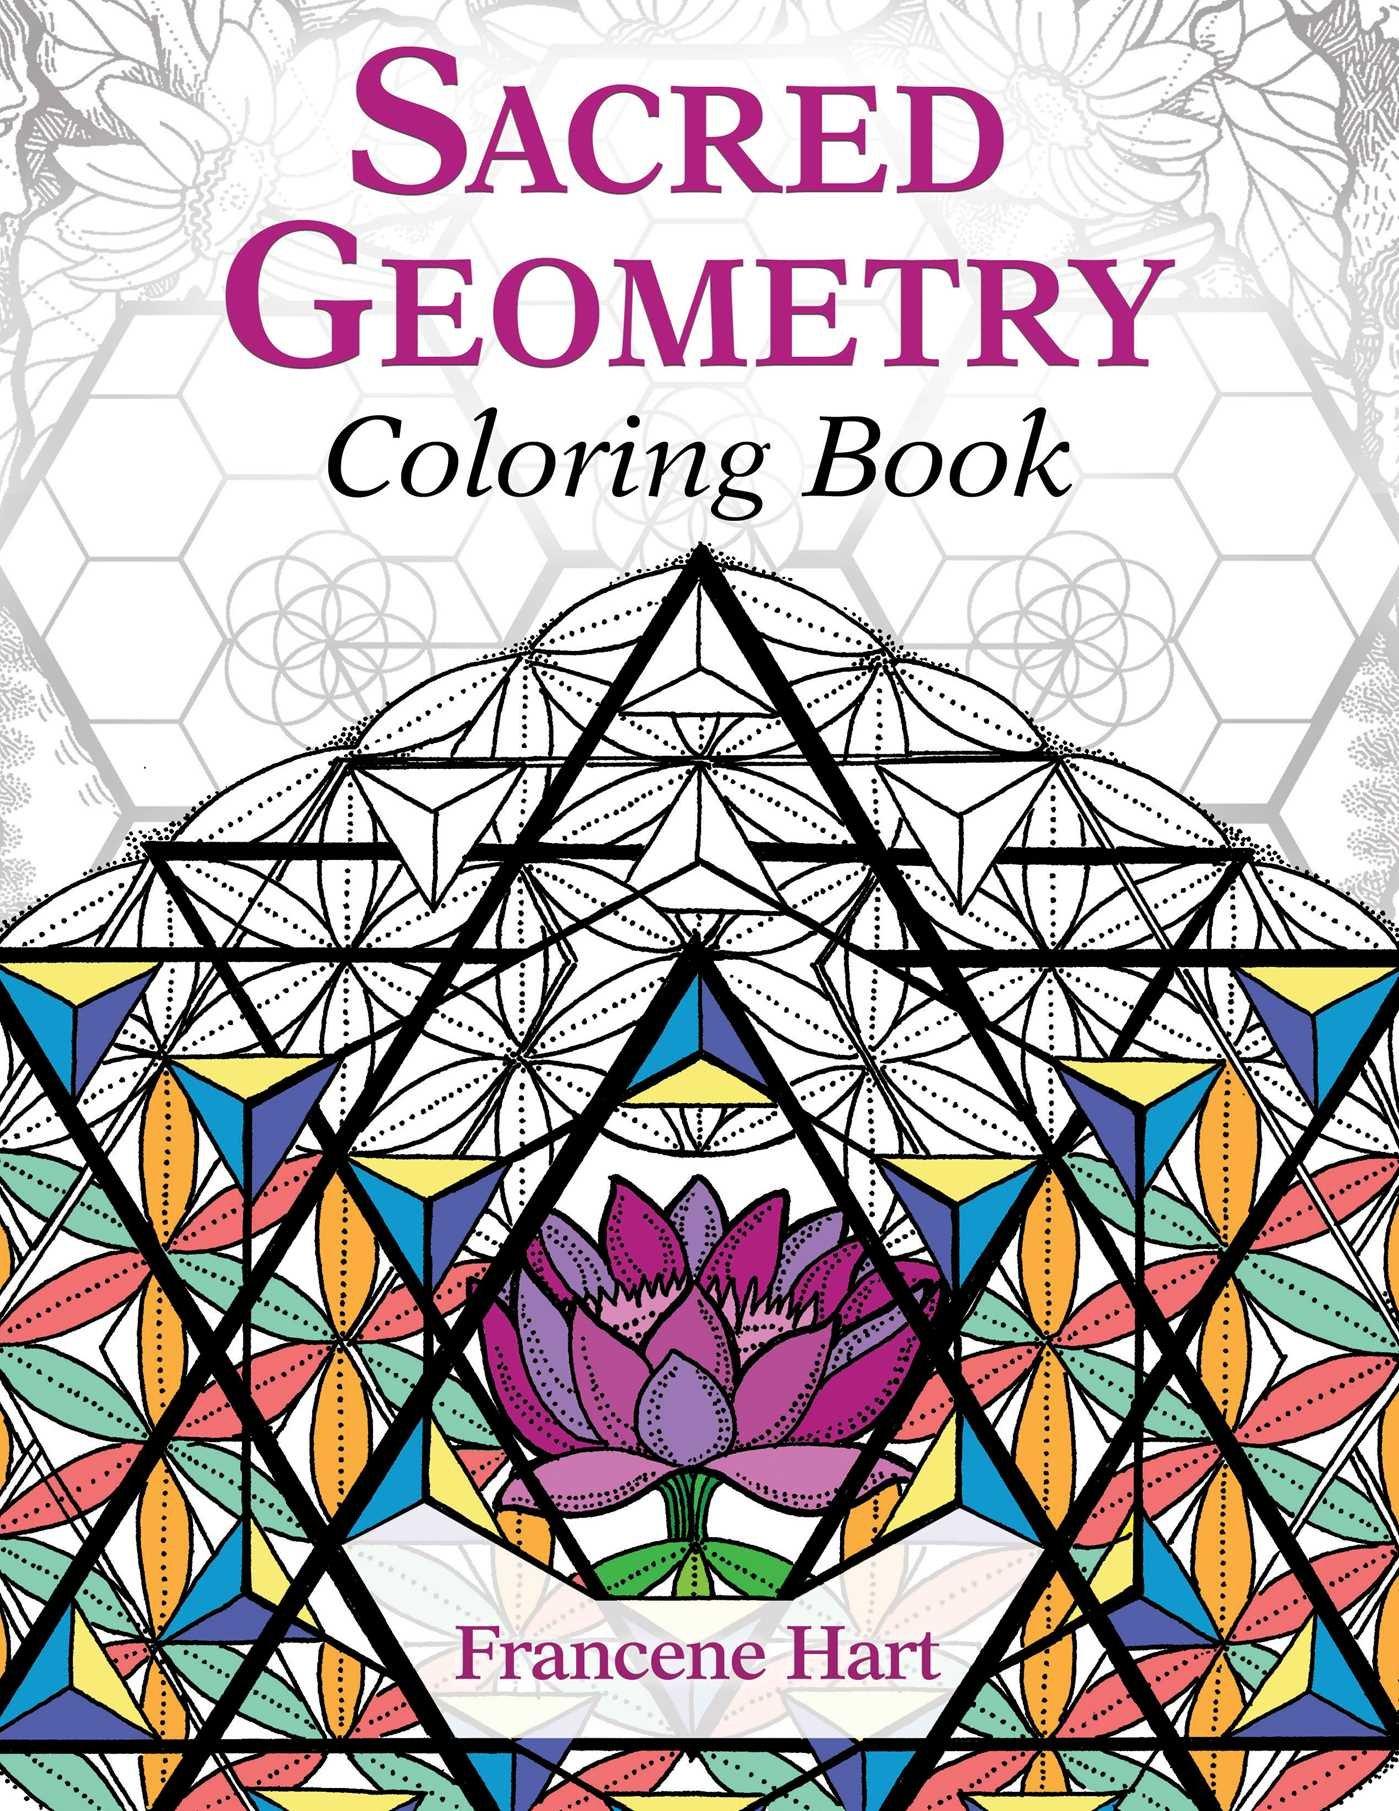 Amazon.com: Sacred Geometry Coloring Book (9781620556528 ...